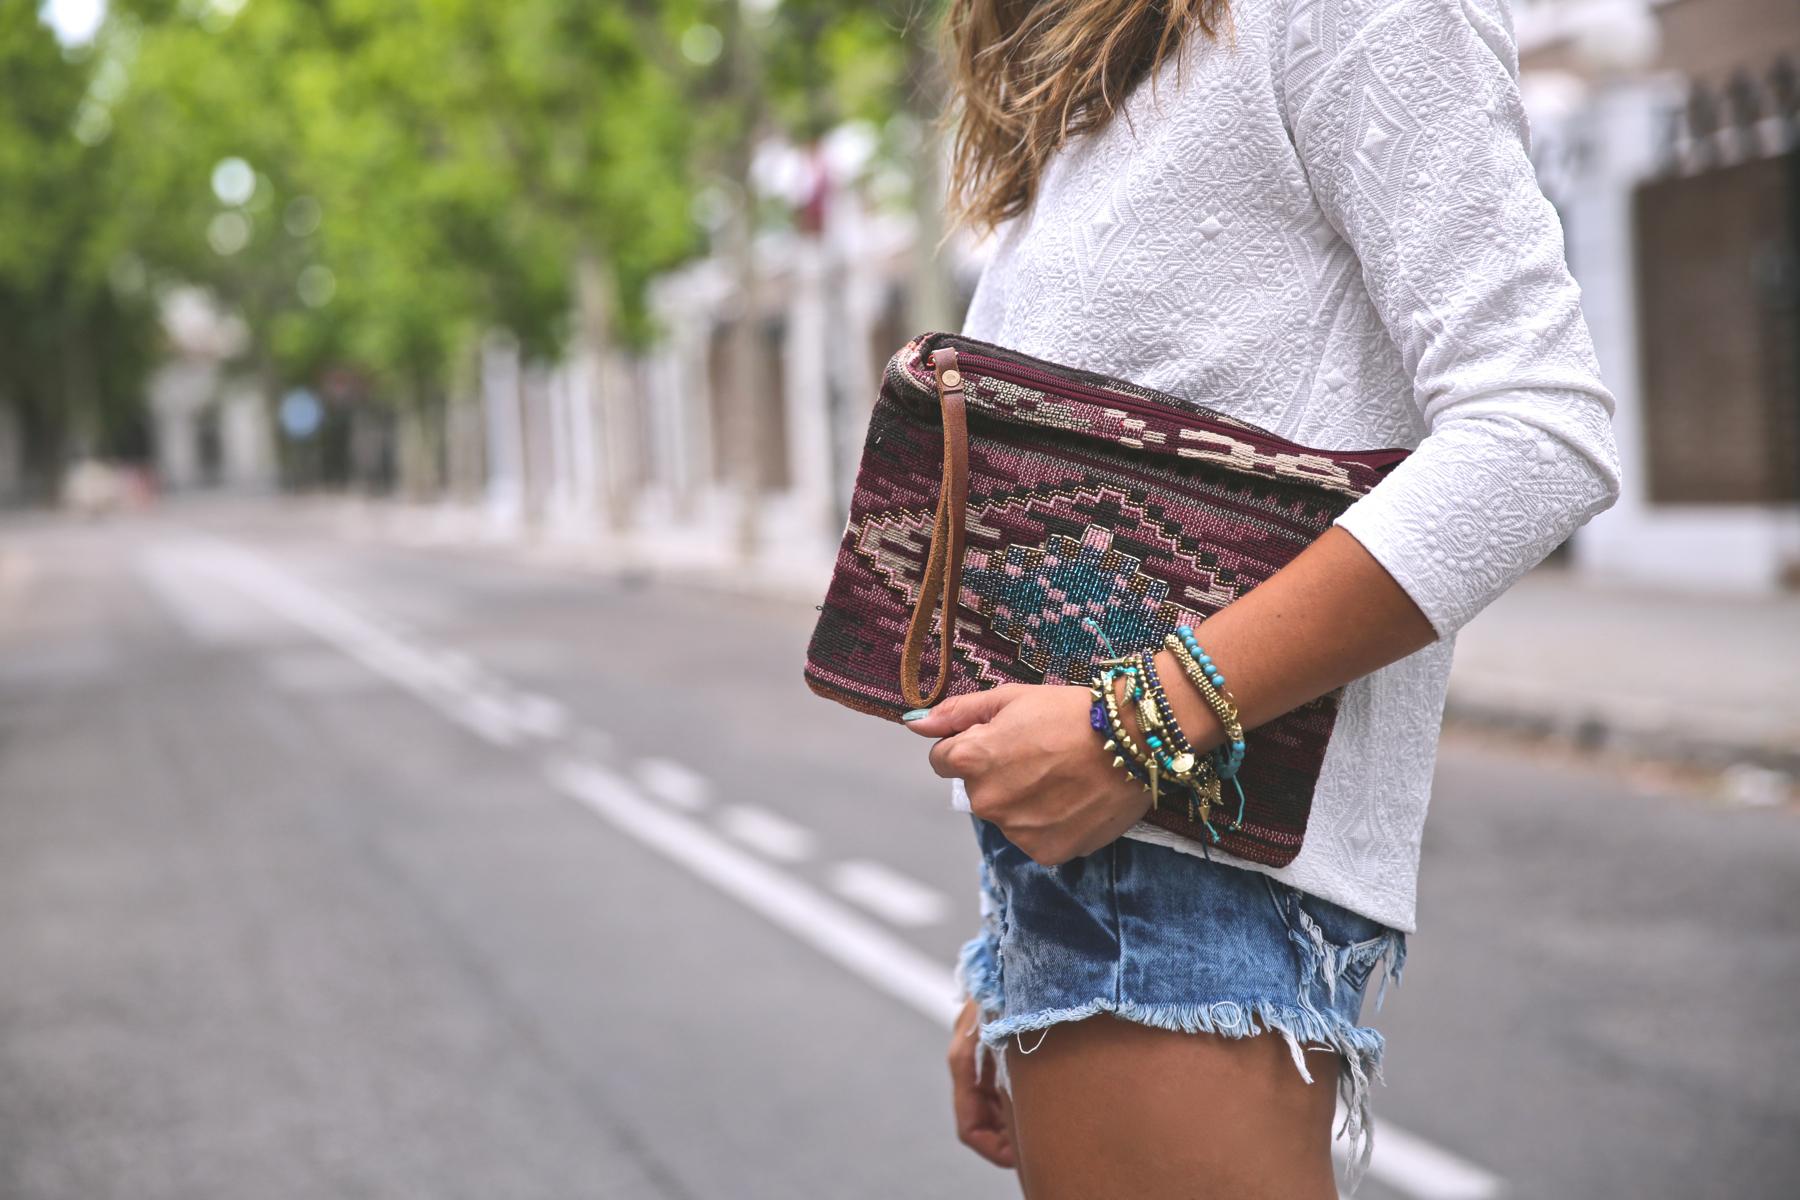 trendy_taste-look-outfit-street_style-ootd-blog-blogger-fashion_spain-moda_españa-denim_shorts-shorts_vaqueros-top_blanco-white_top-sandalias_cordones-ethnic_cluth-clutch_etnico-el_corte_ingles-3